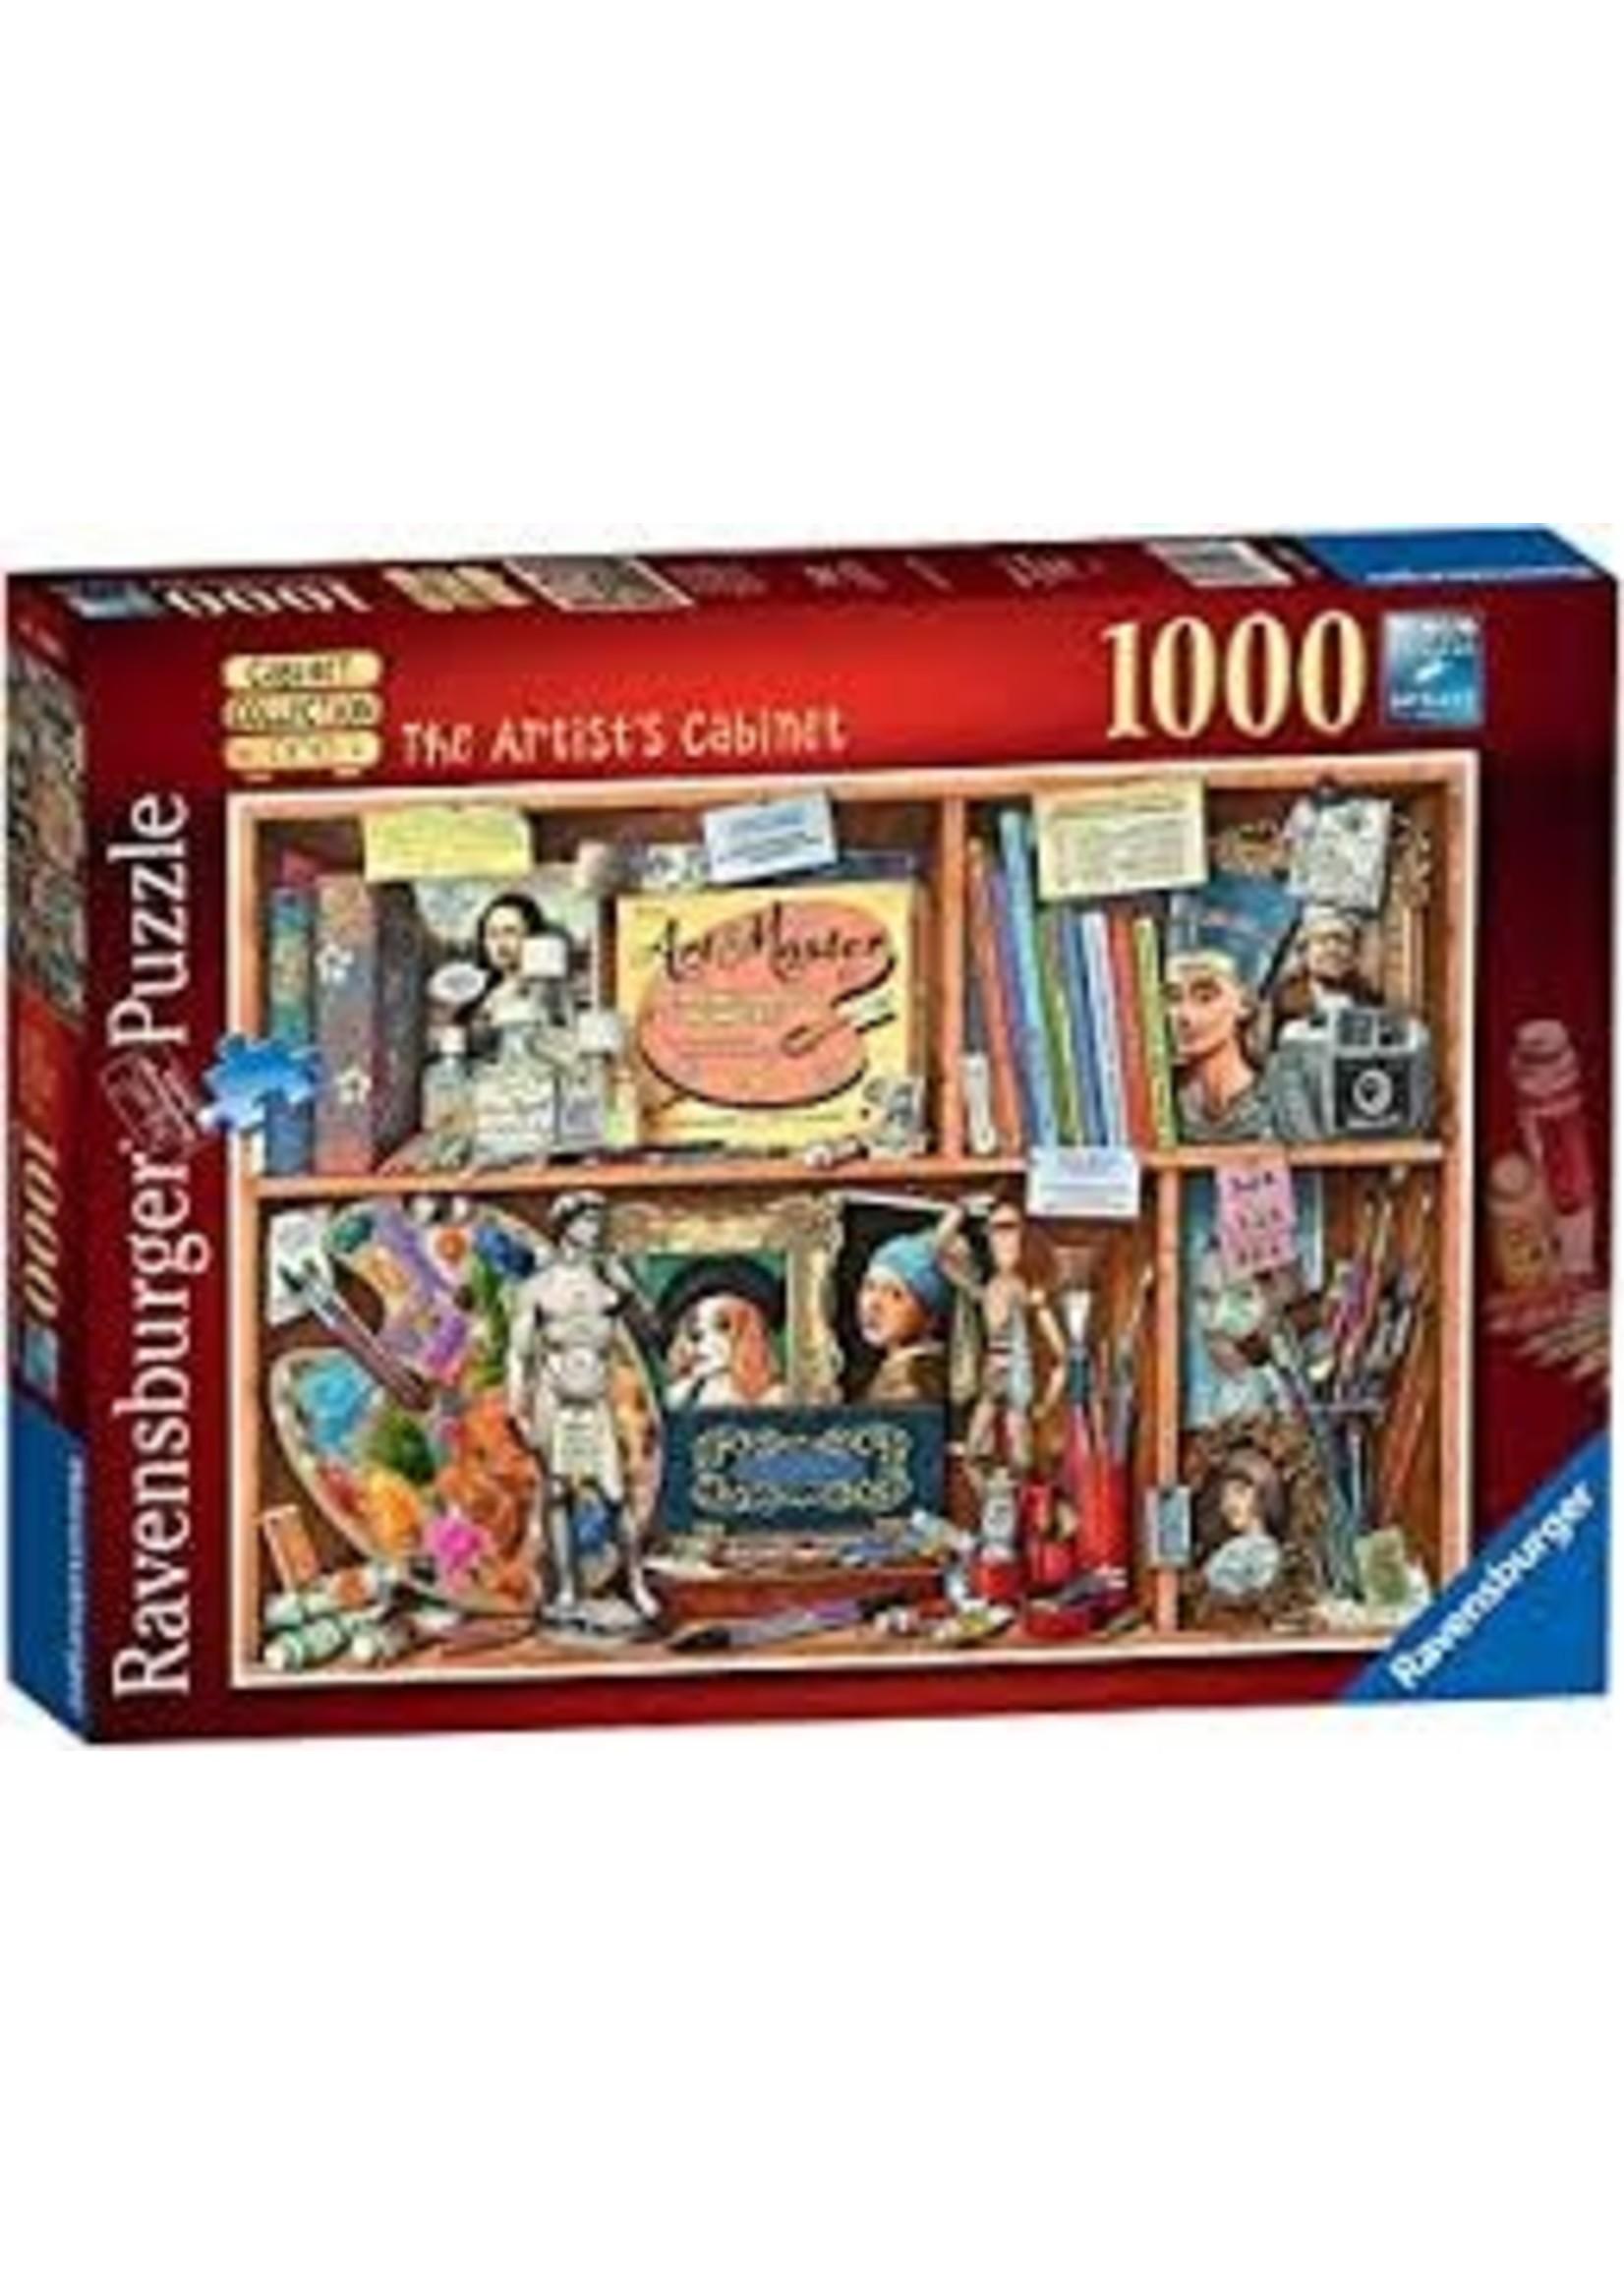 Ravensburger 1000pc puzzle The Artist's Cabinet